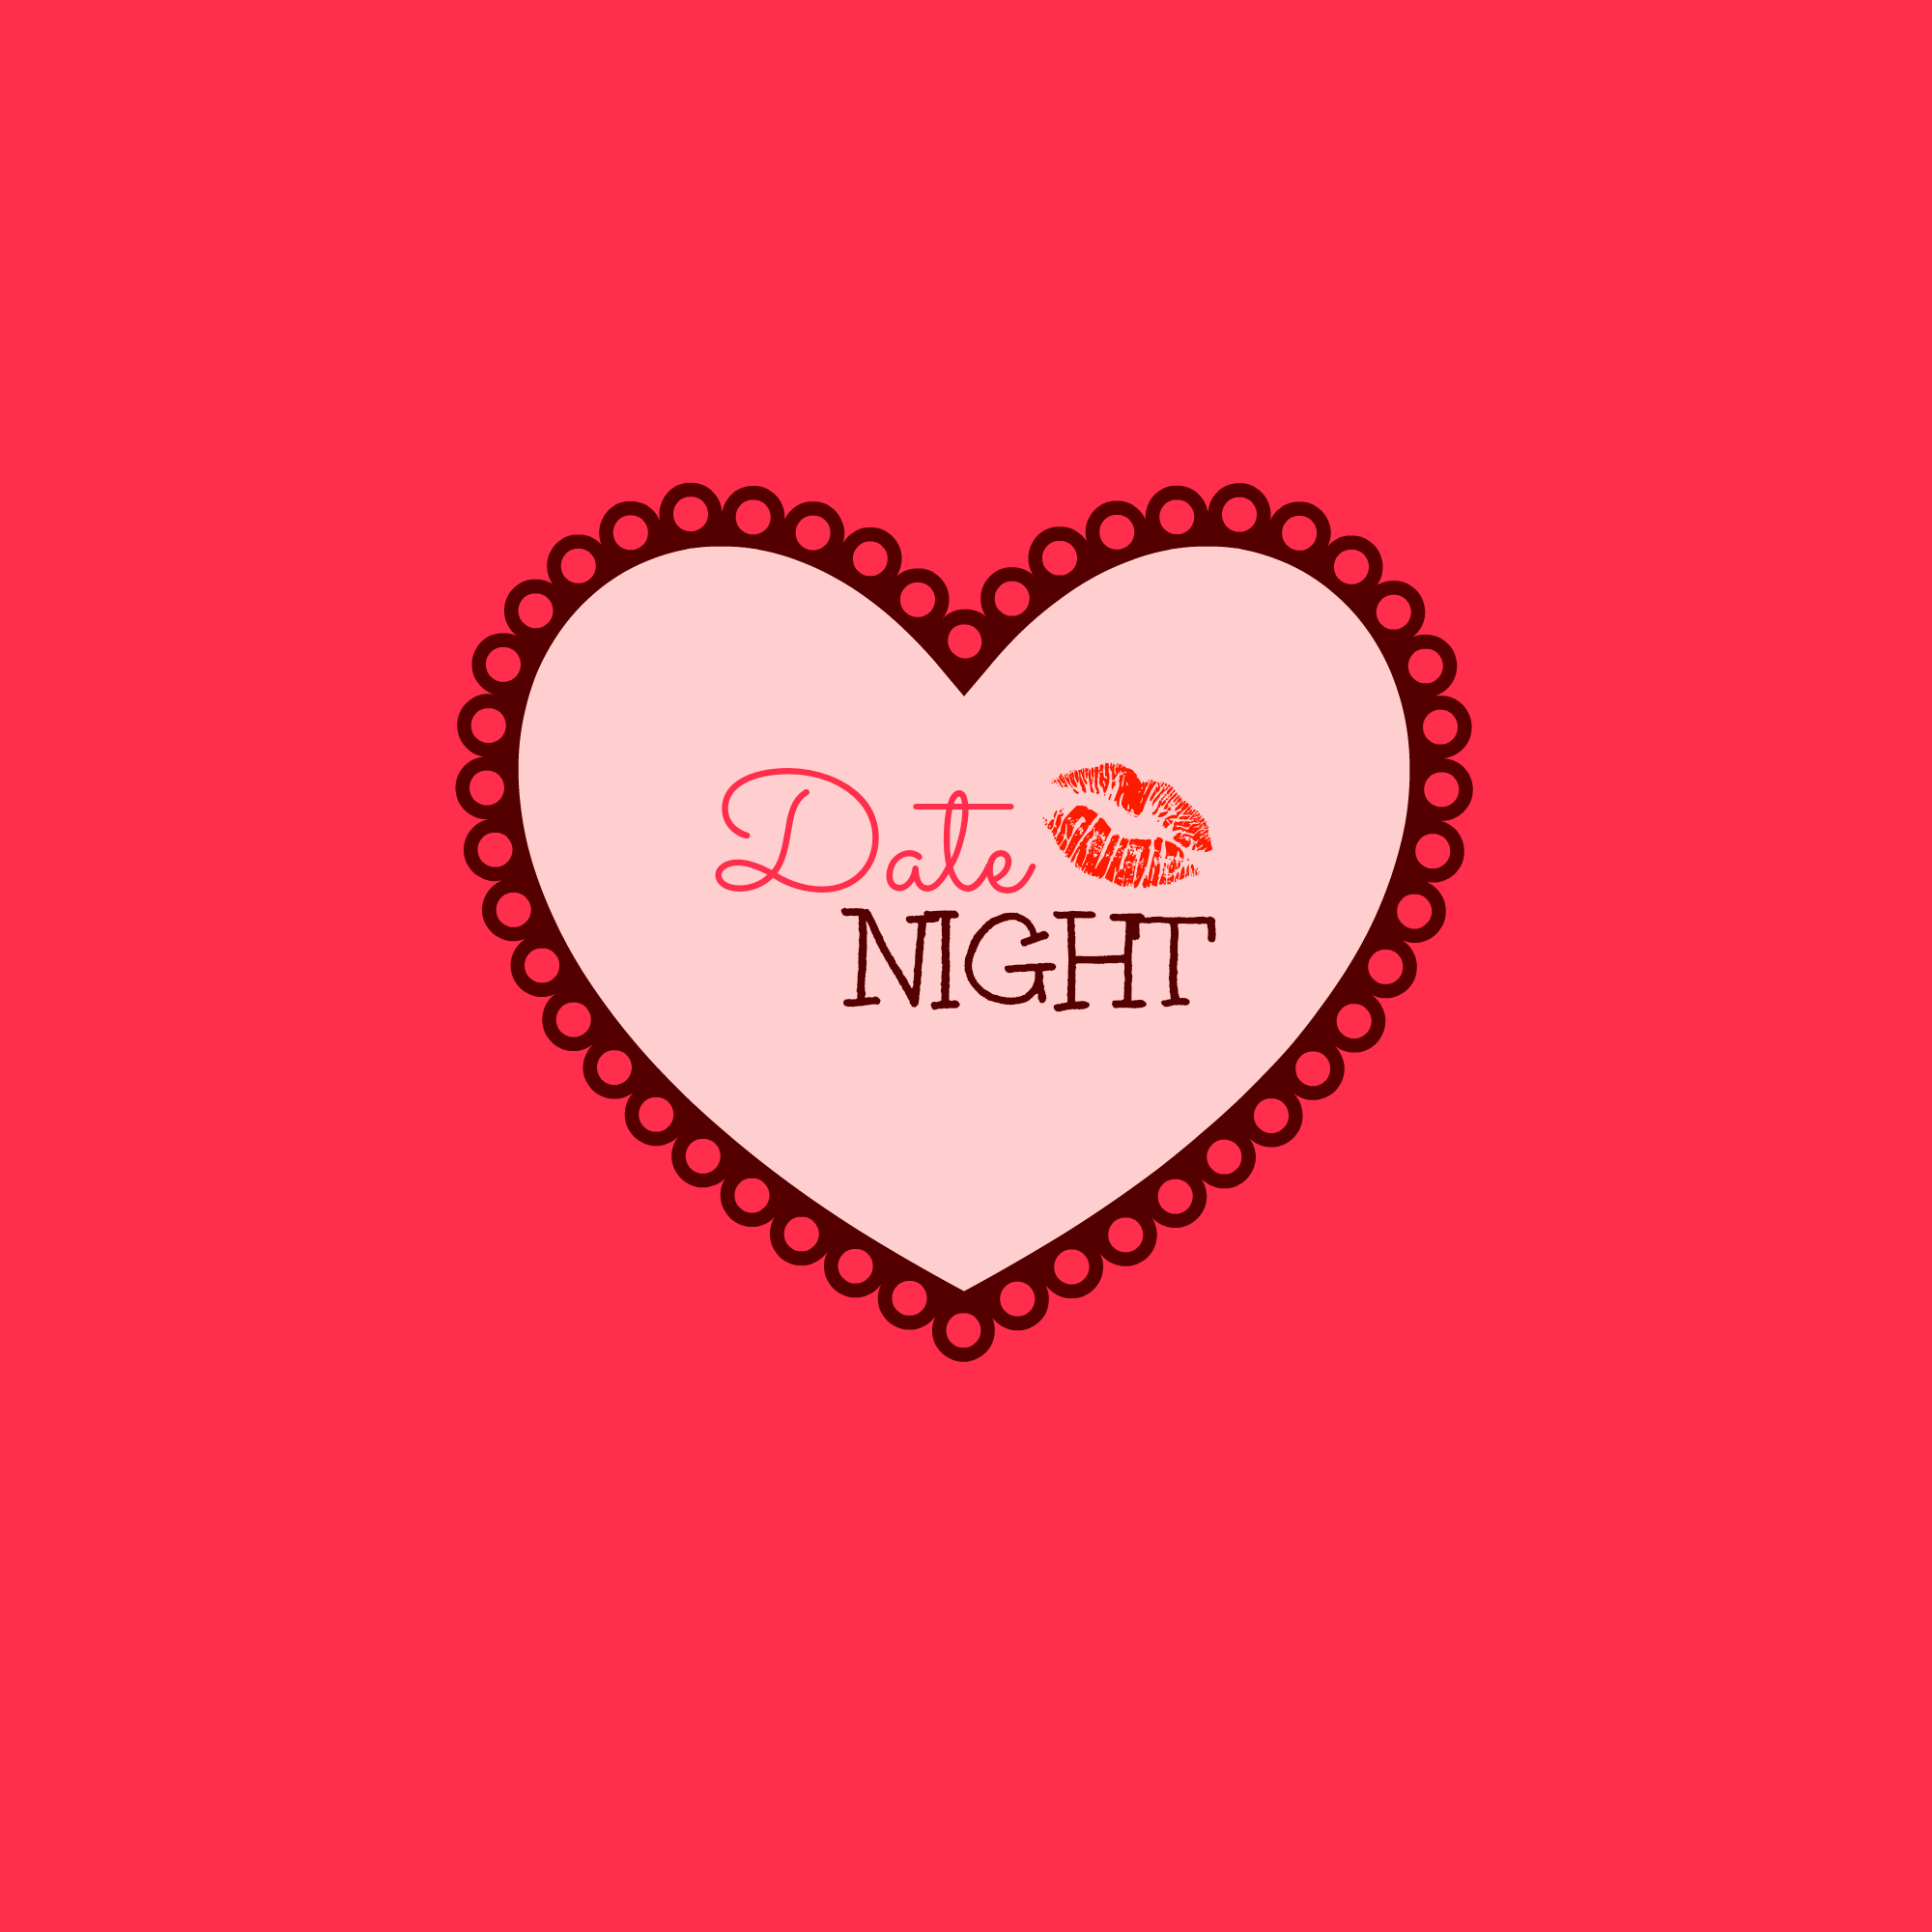 Date clipart date night Photo Life girlsnight DATENIGHT Planner